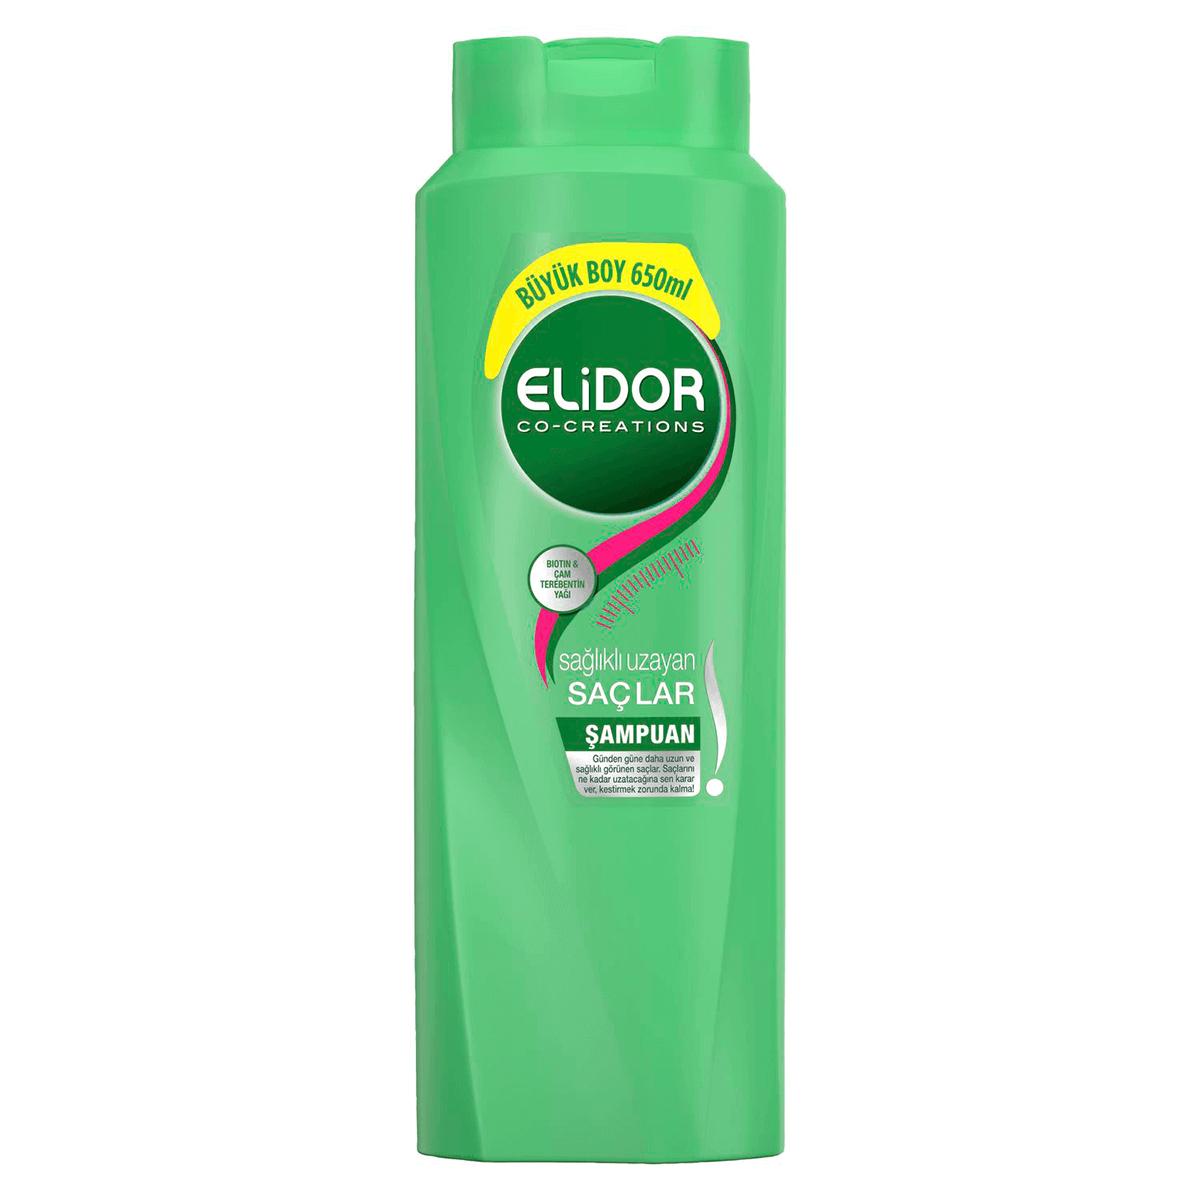 ELIDOR 650 ML صحية لتمديد الشعر